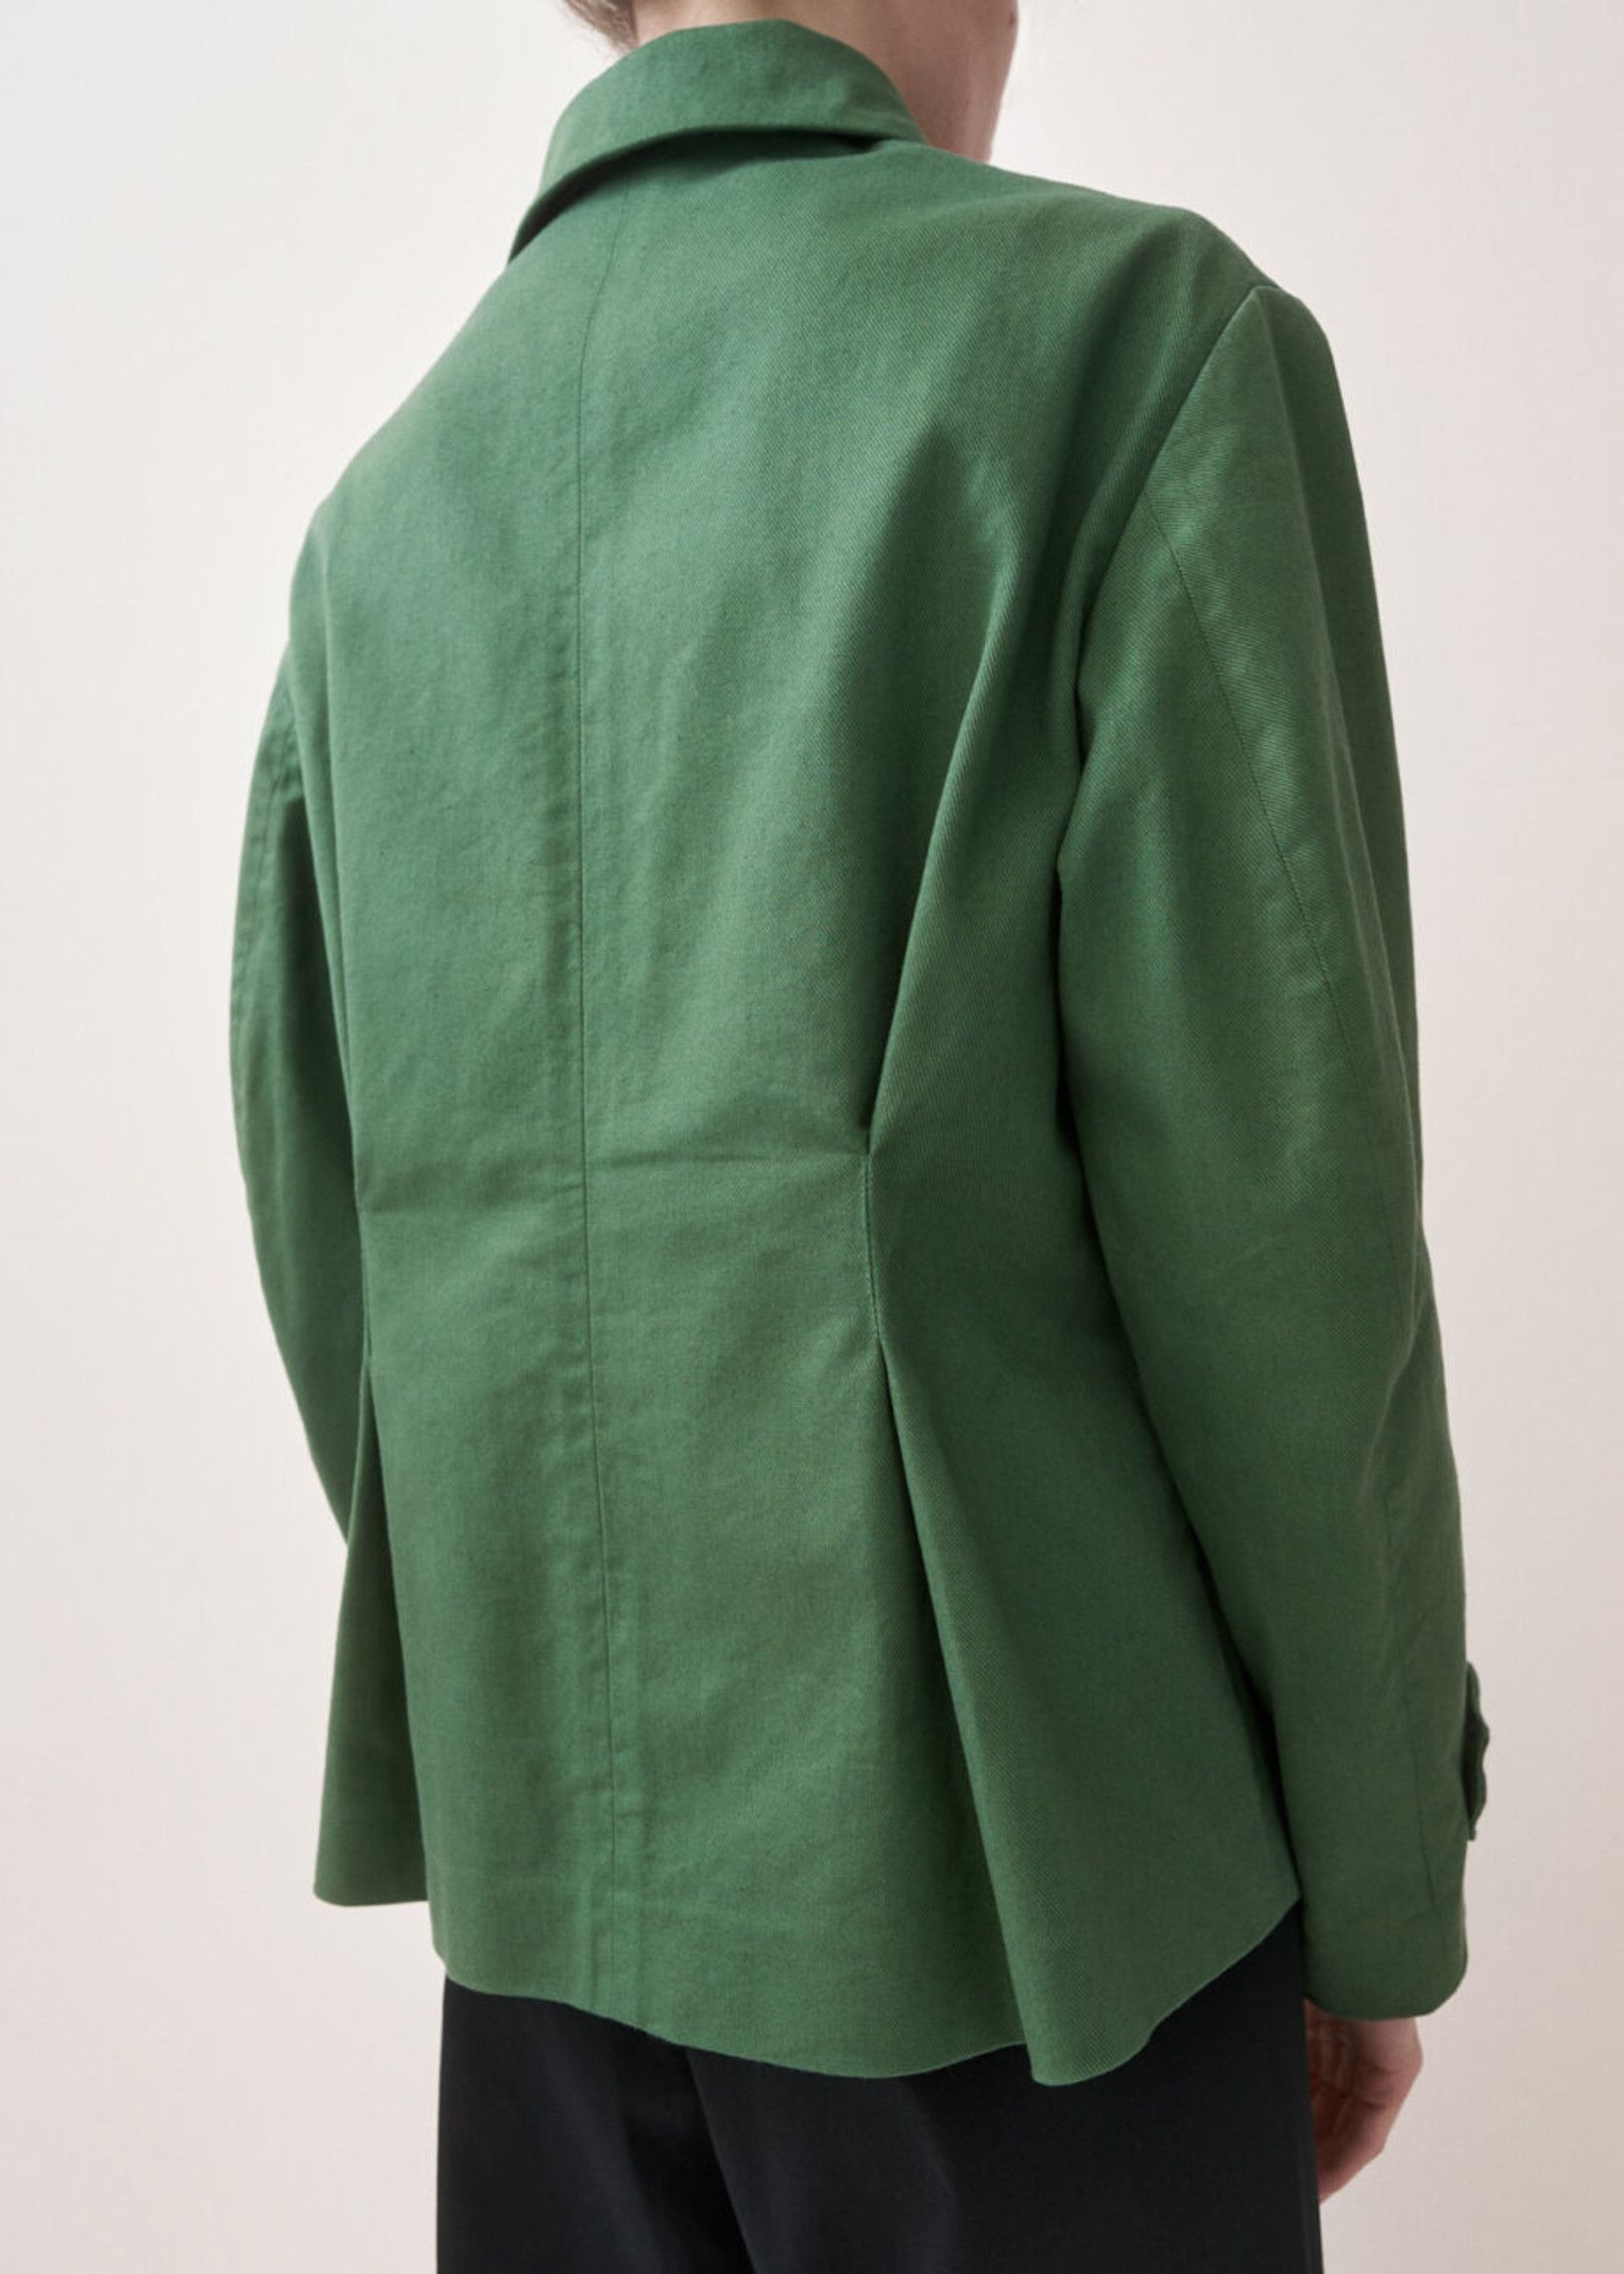 rikastudios rika studios bianca jacket army green